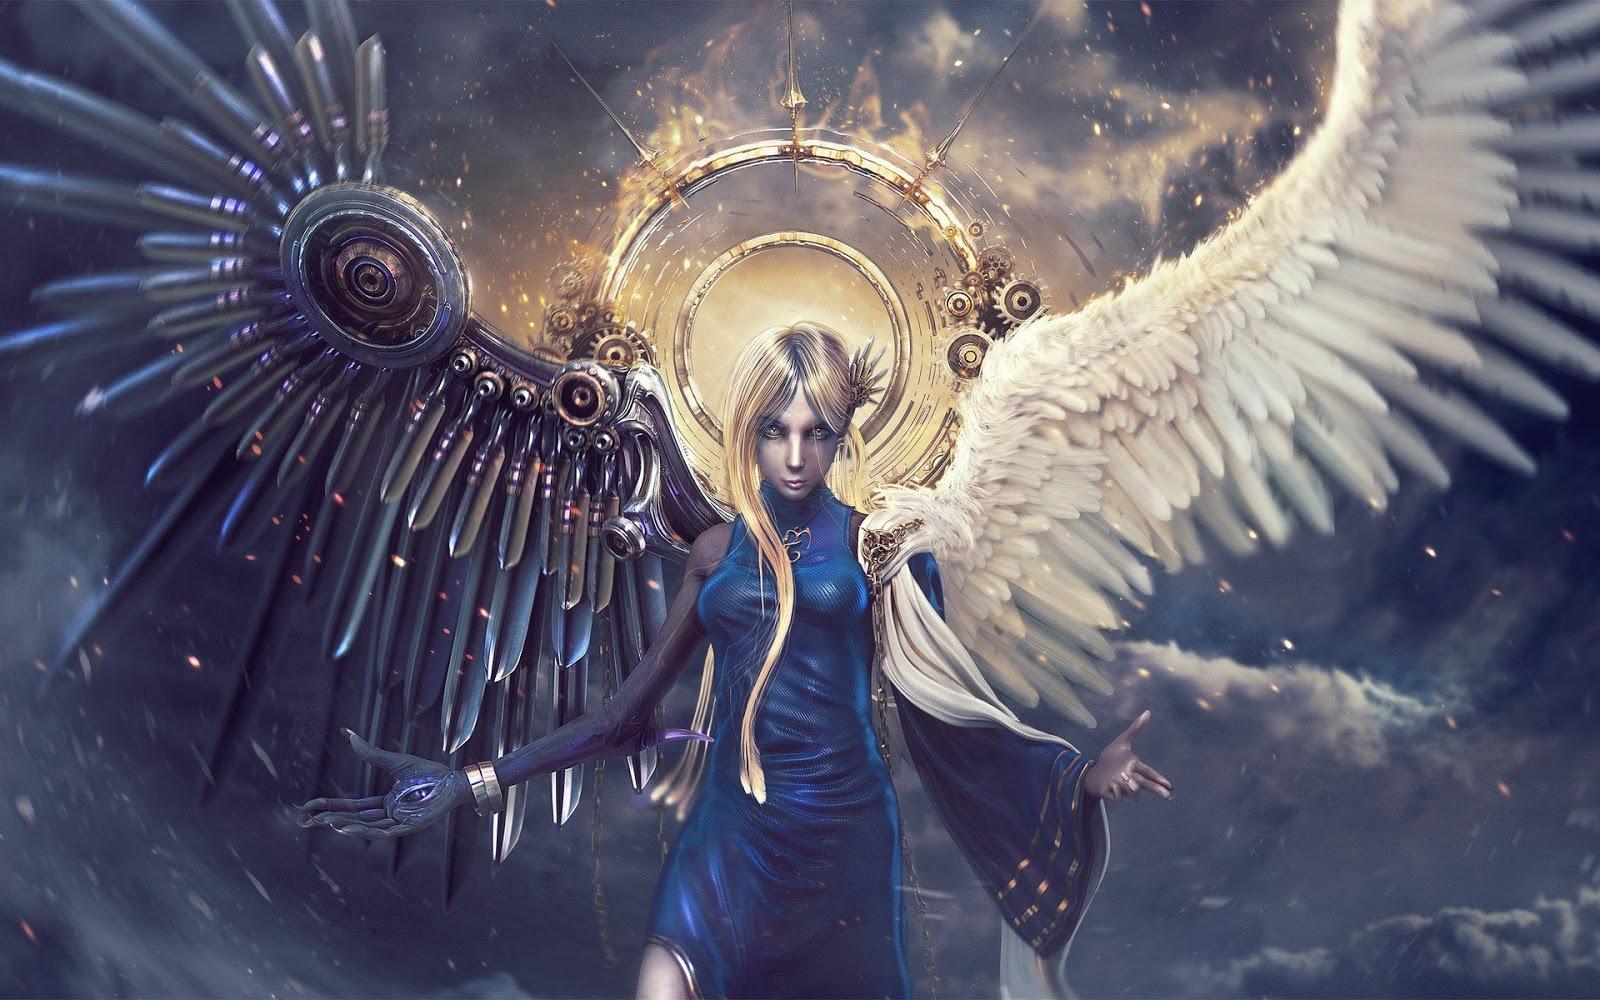 Wallpaper Hd Angels Demons | Free Download Wallpaper | DaWallpaperz